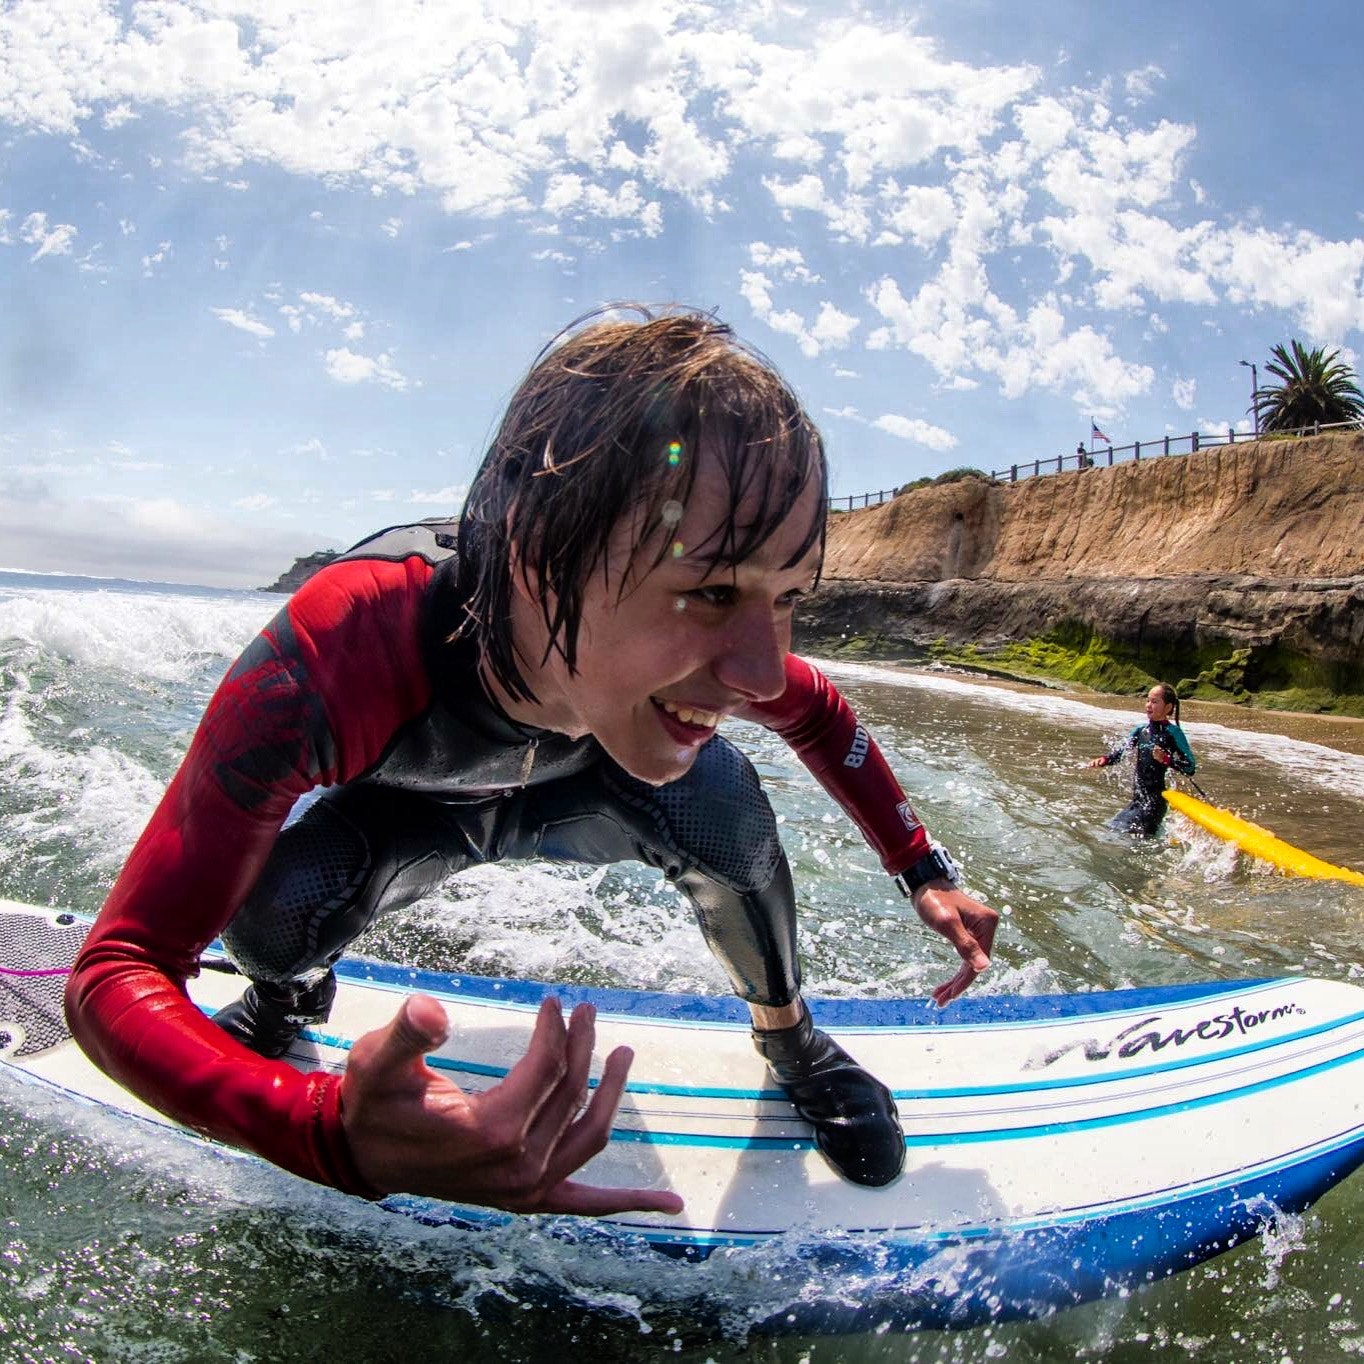 Young Santa Cruz surfer